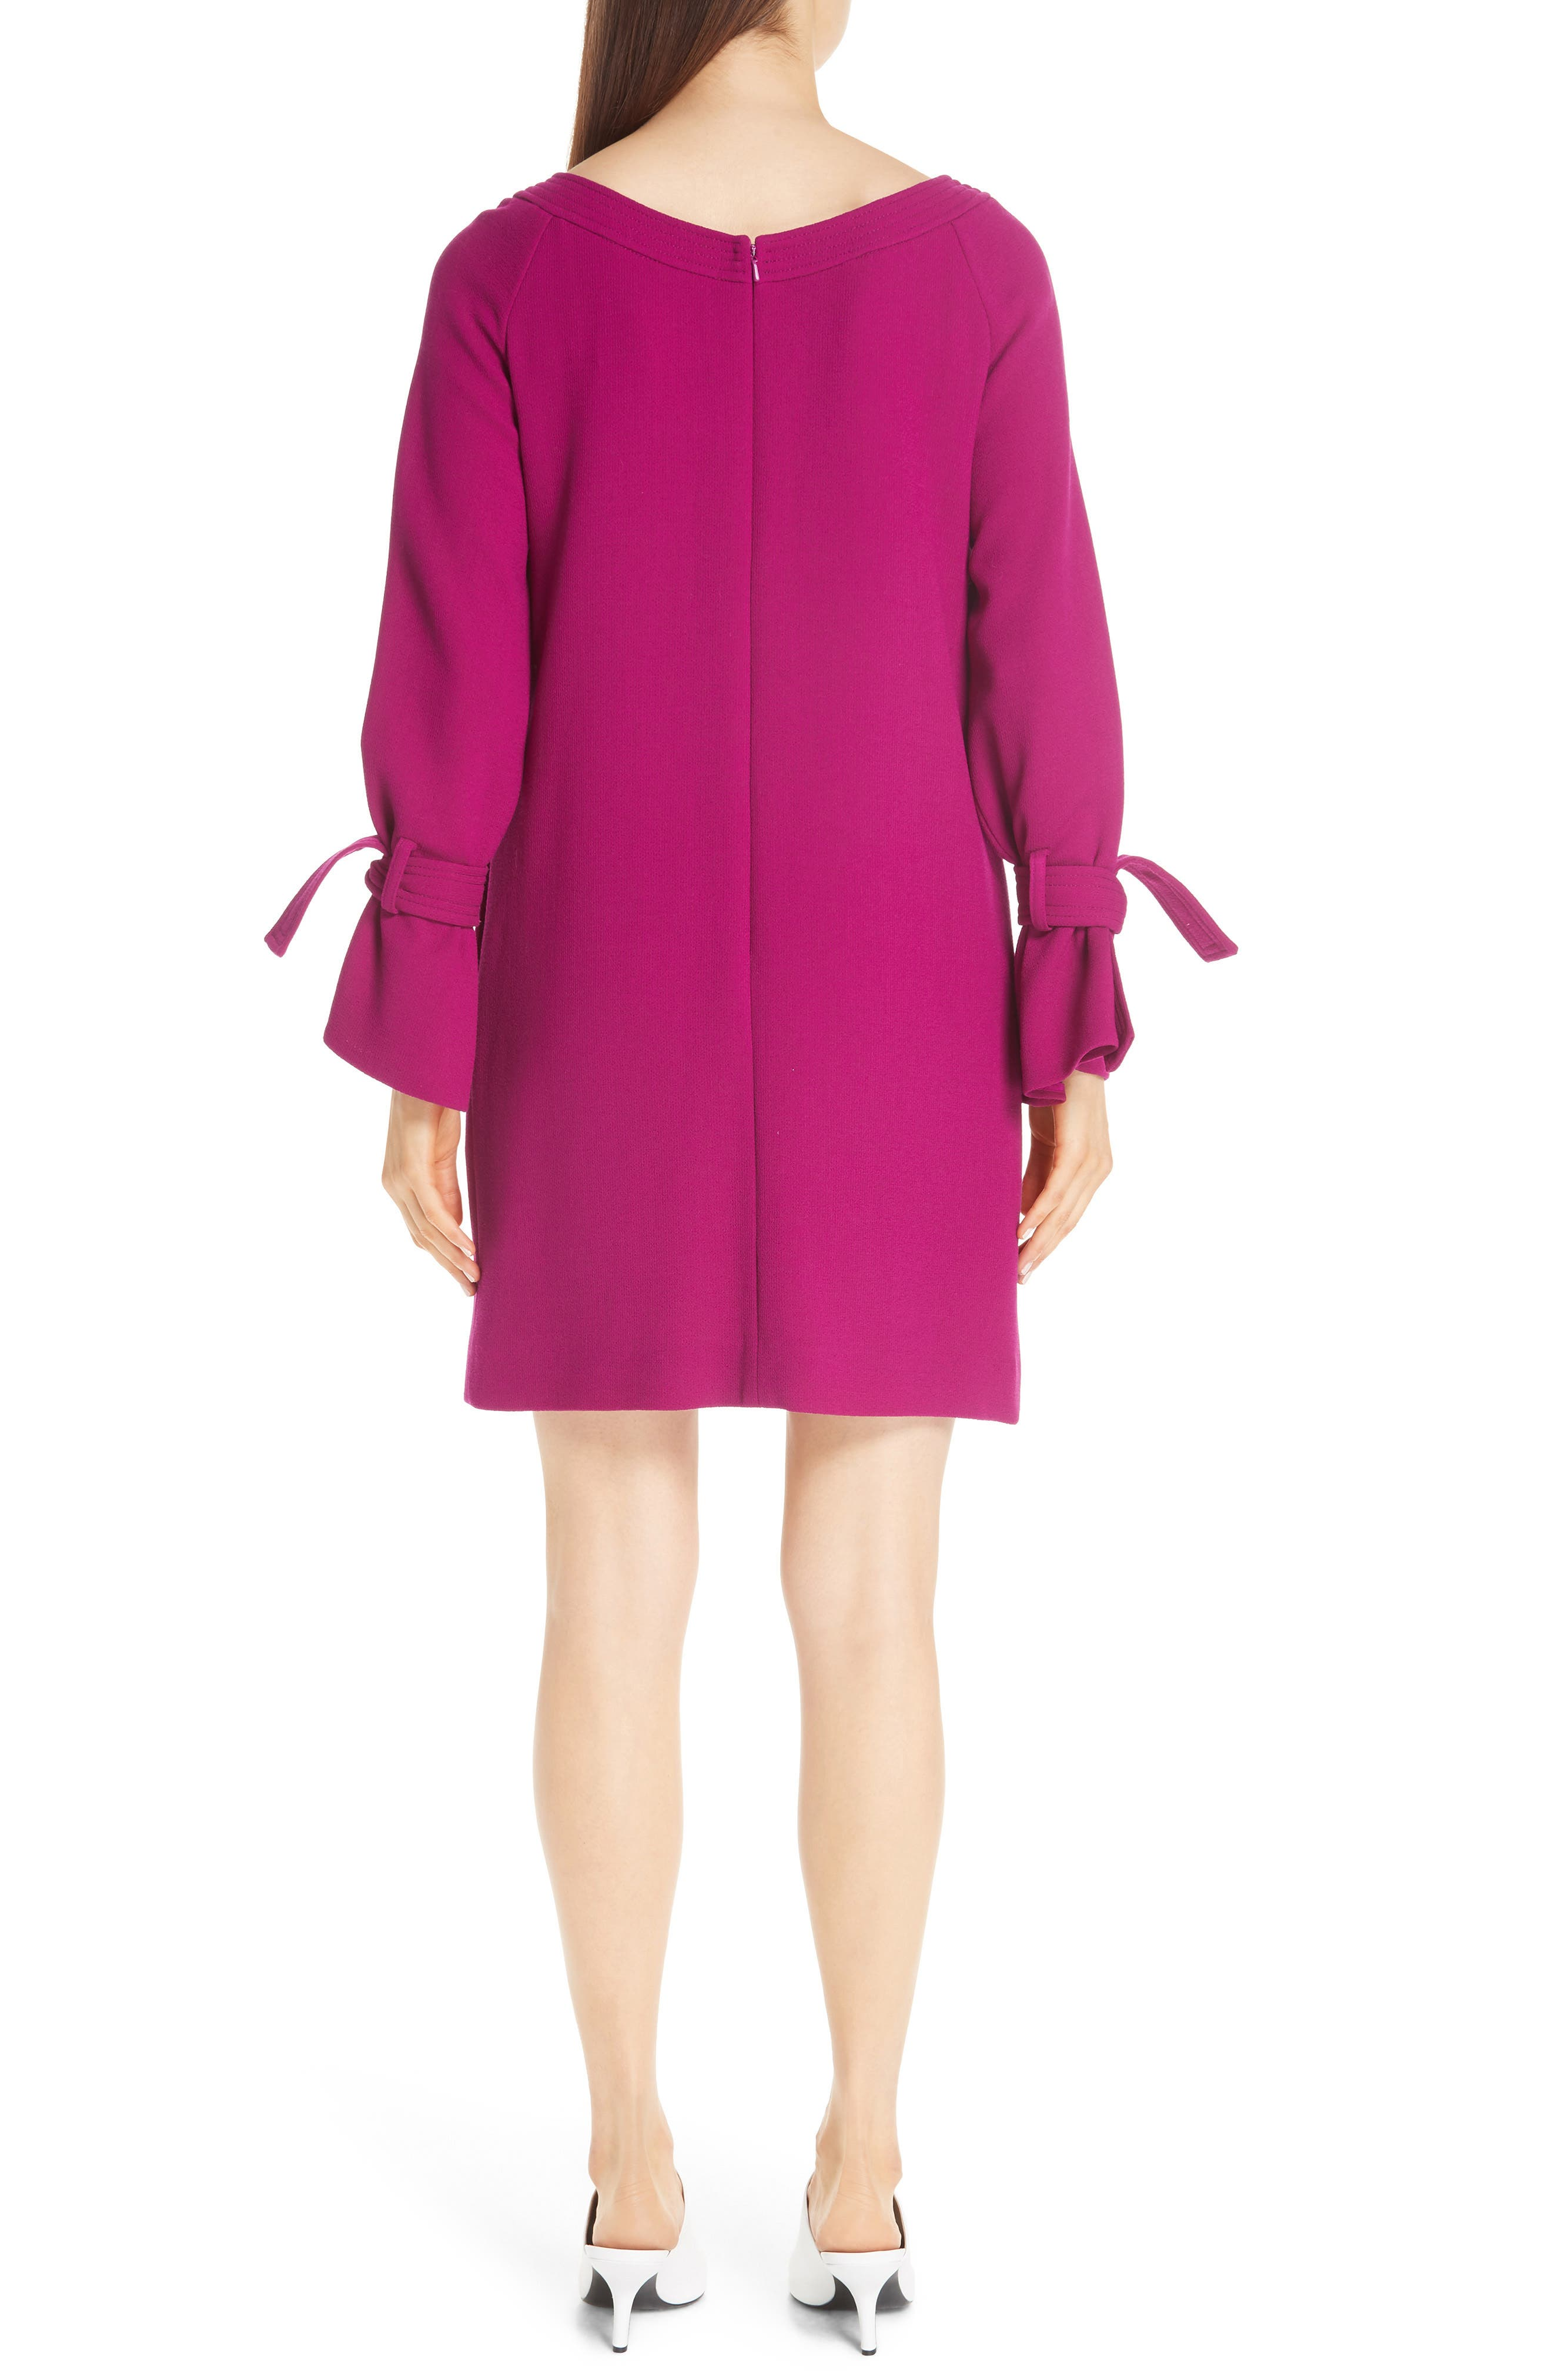 LELA ROSE, Tie Cuff Wool Blend Crepe Shift Dress, Alternate thumbnail 2, color, MAGENTA